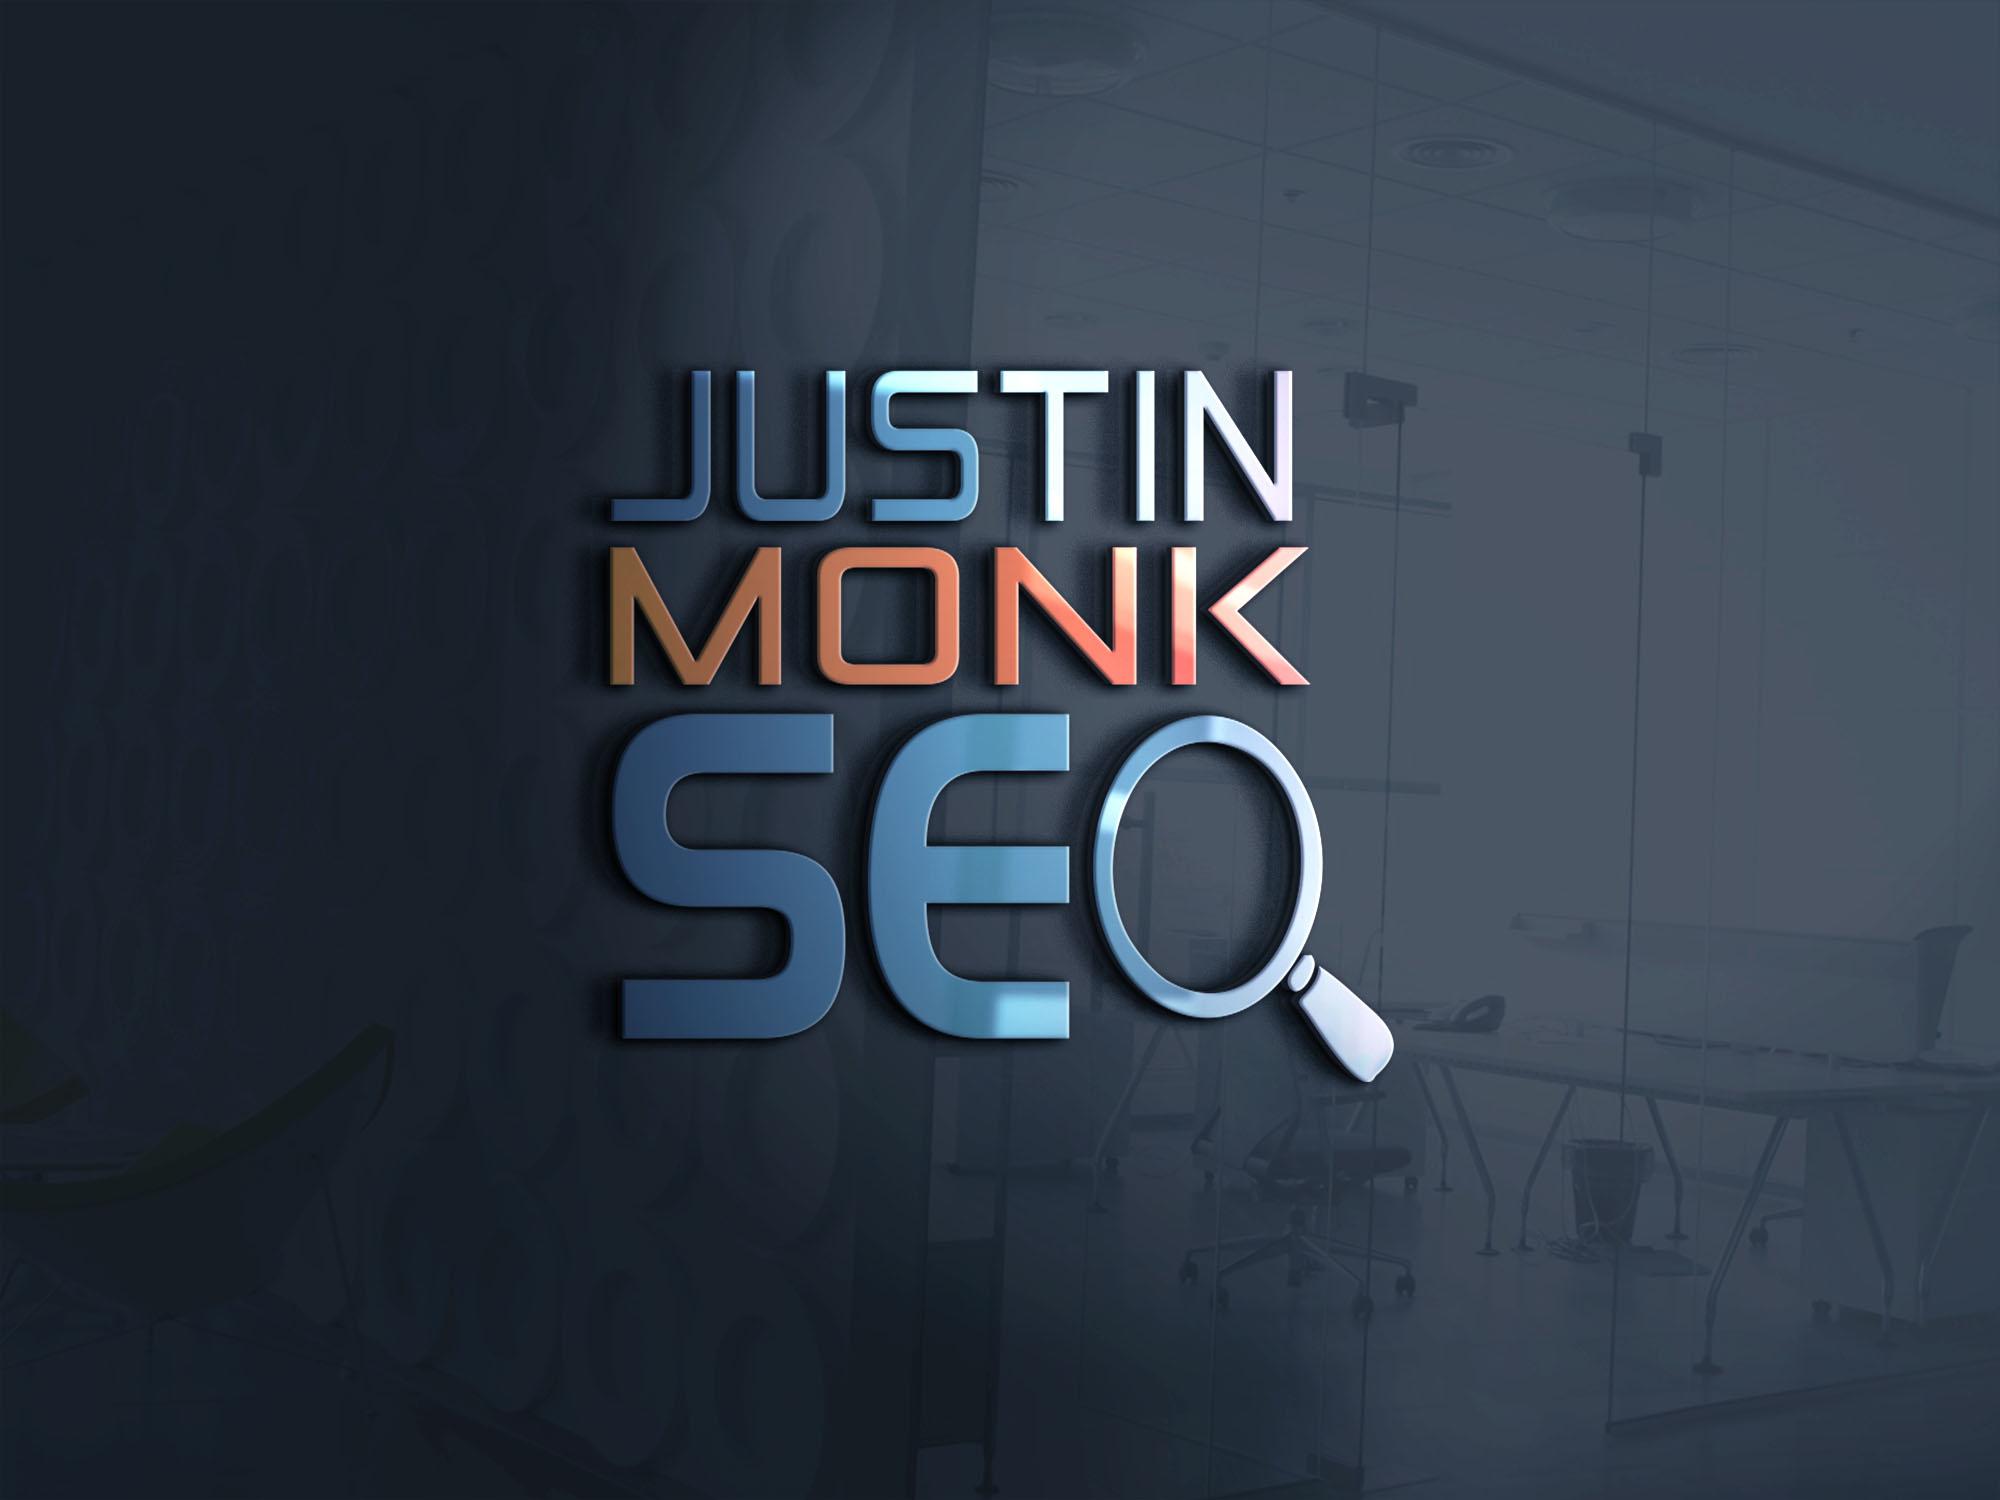 Justin Monk SEO - Salt Lake City image 0